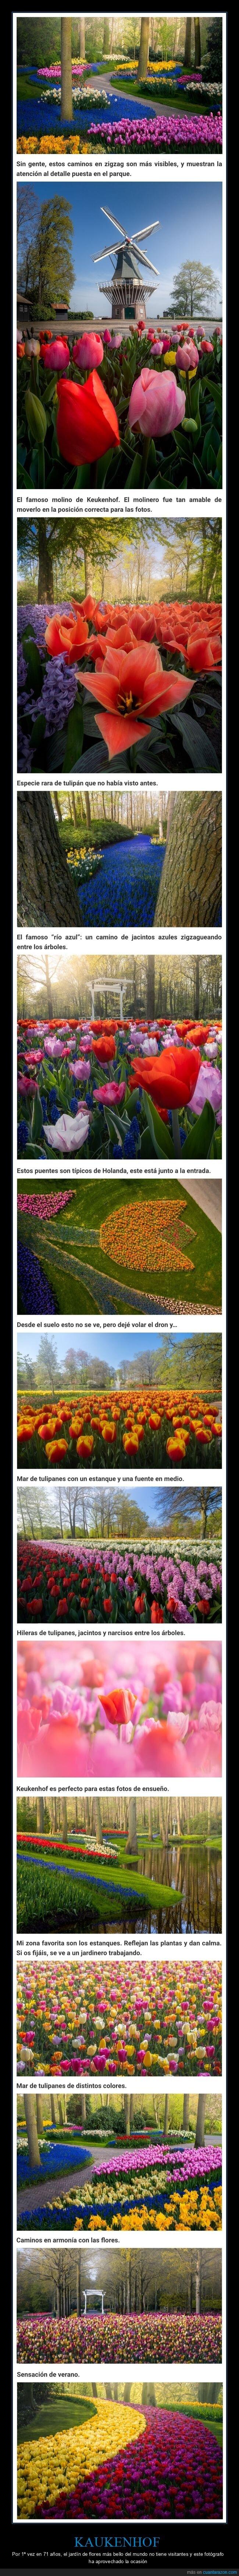 fotografía,holanda,jardín de flores,keukenhof